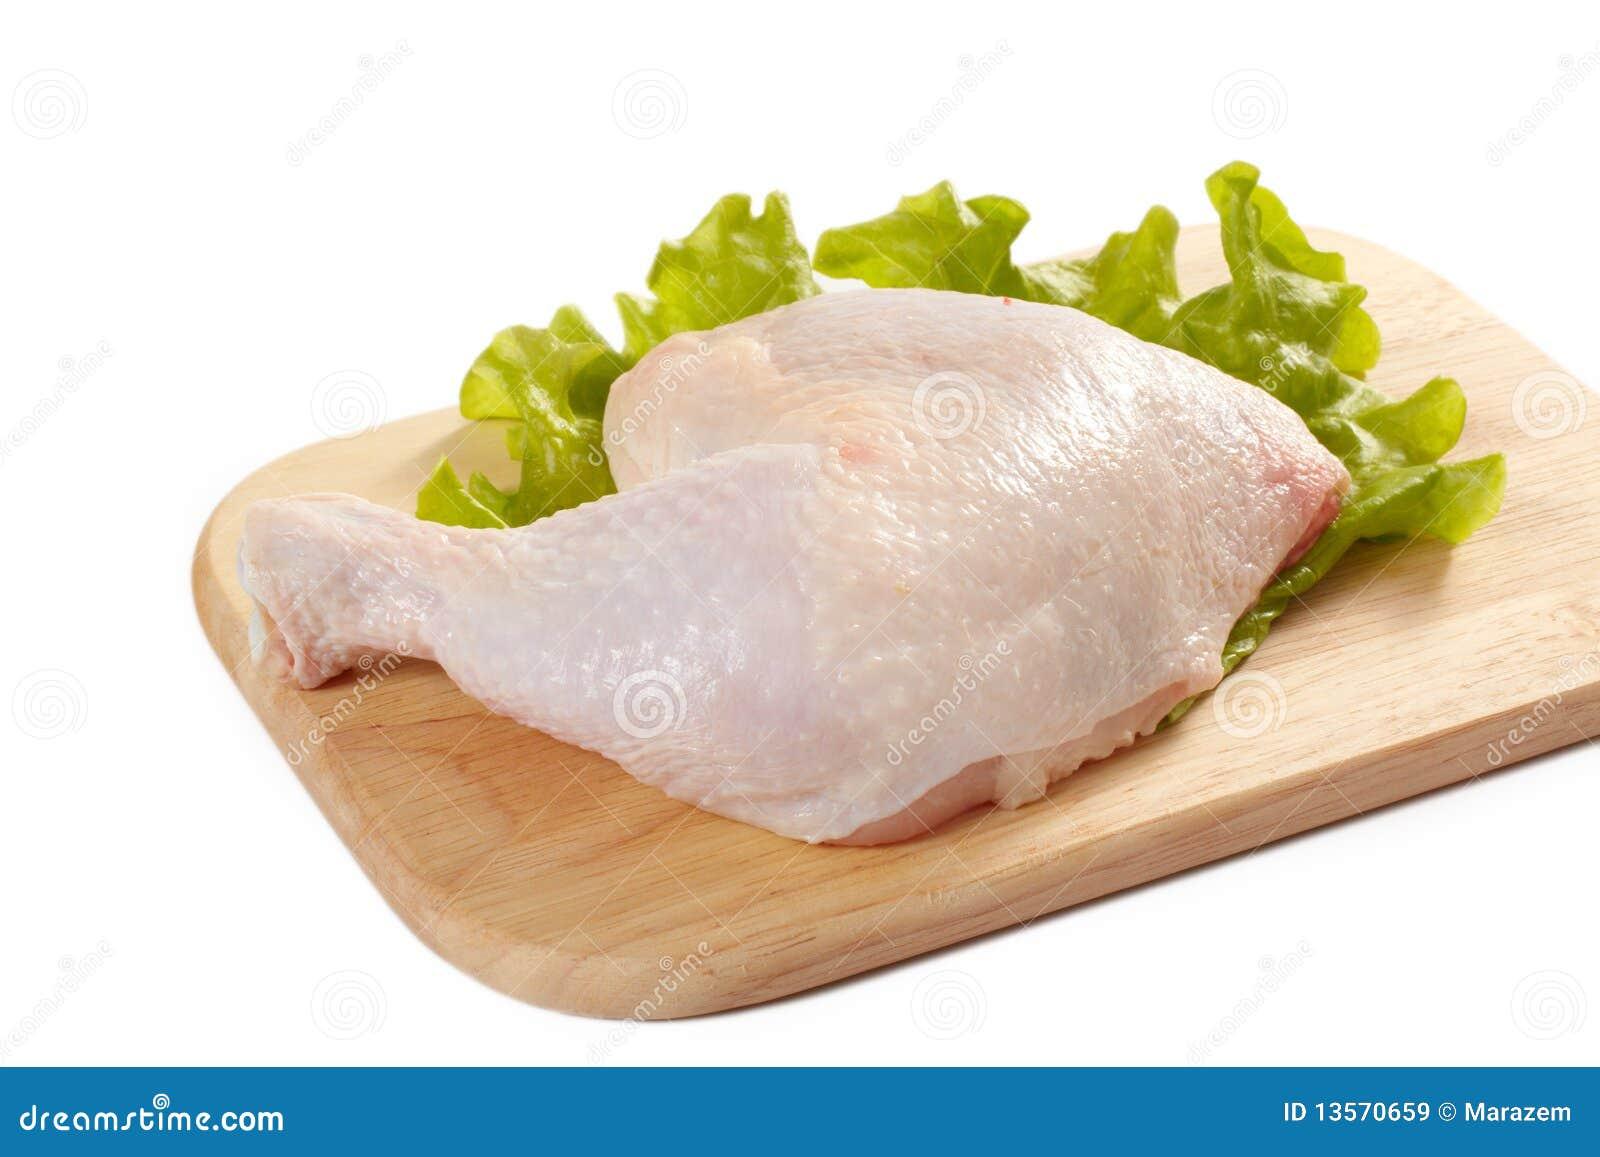 Raw chicken leg stock image. Image of fresh, white, dinner ...